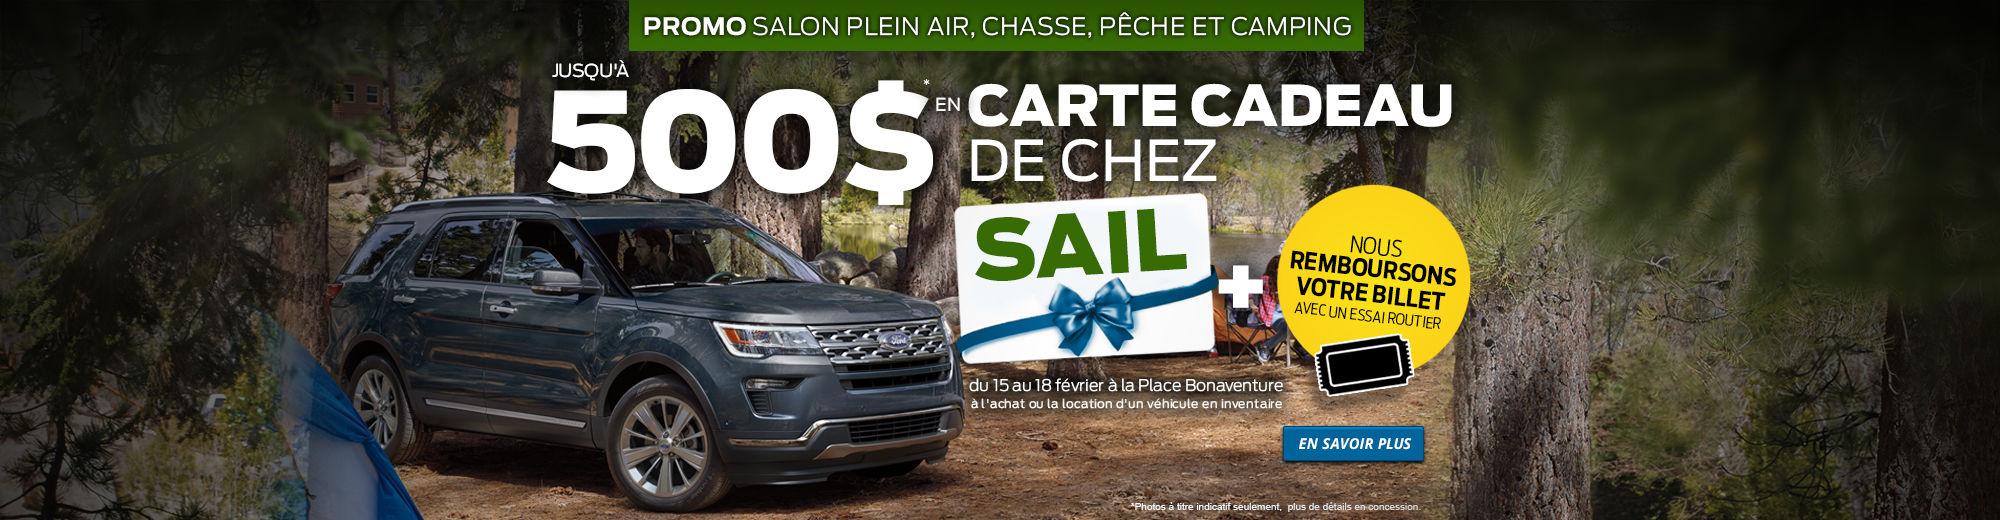 Promo Salon Plein Air, Chasse, Pêche et Camping